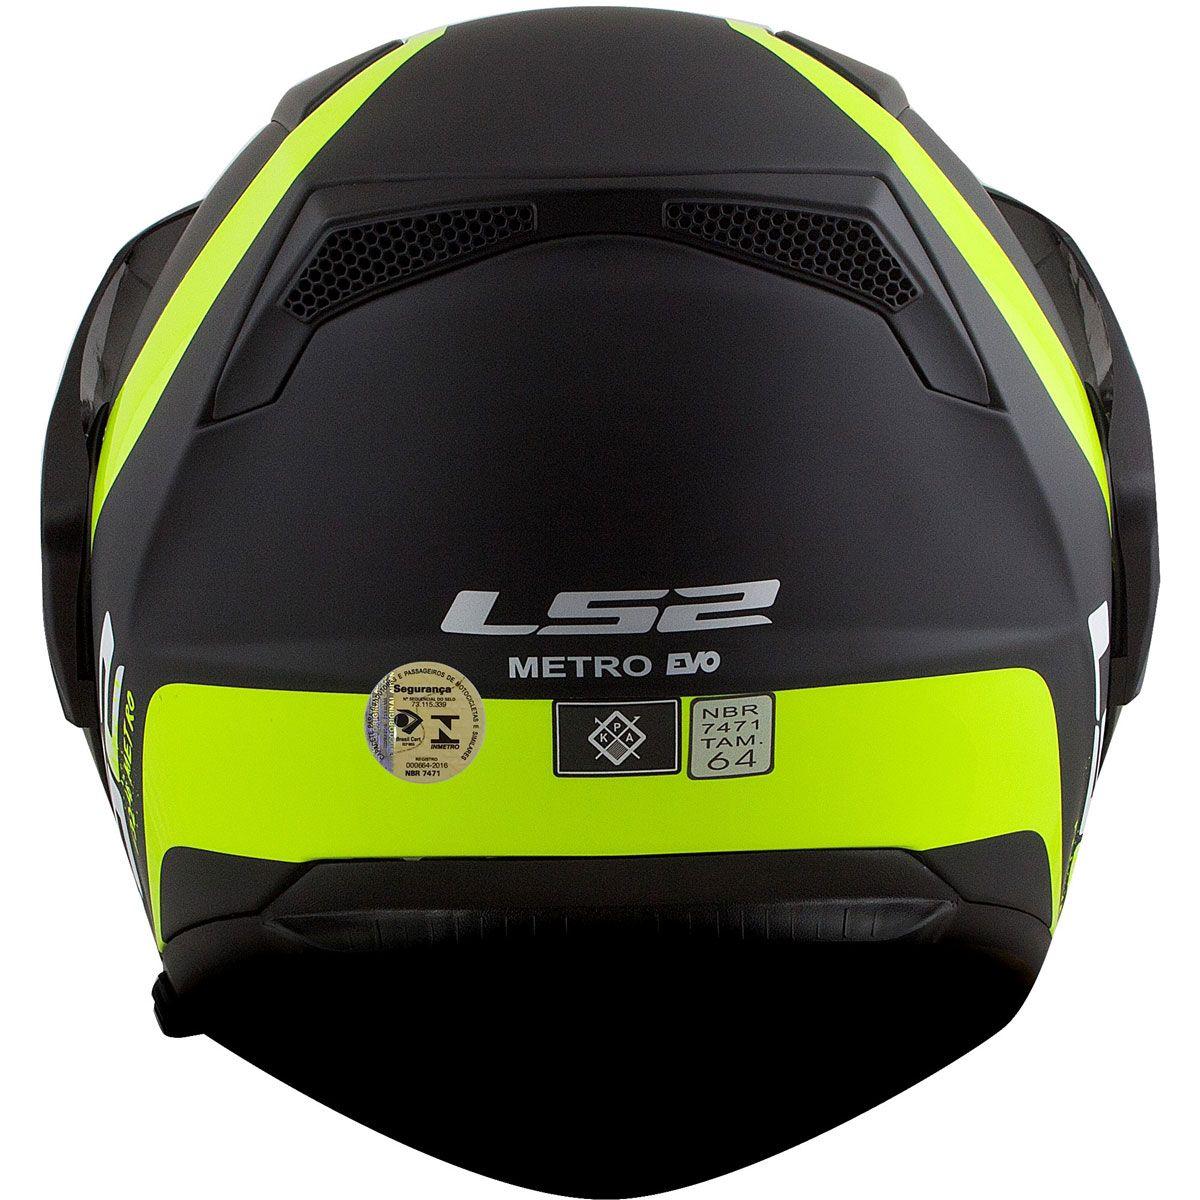 Capacete LS2 FF324 Metro Evo Rapid Black/ Yellow  - Nova Centro Boutique Roupas para Motociclistas